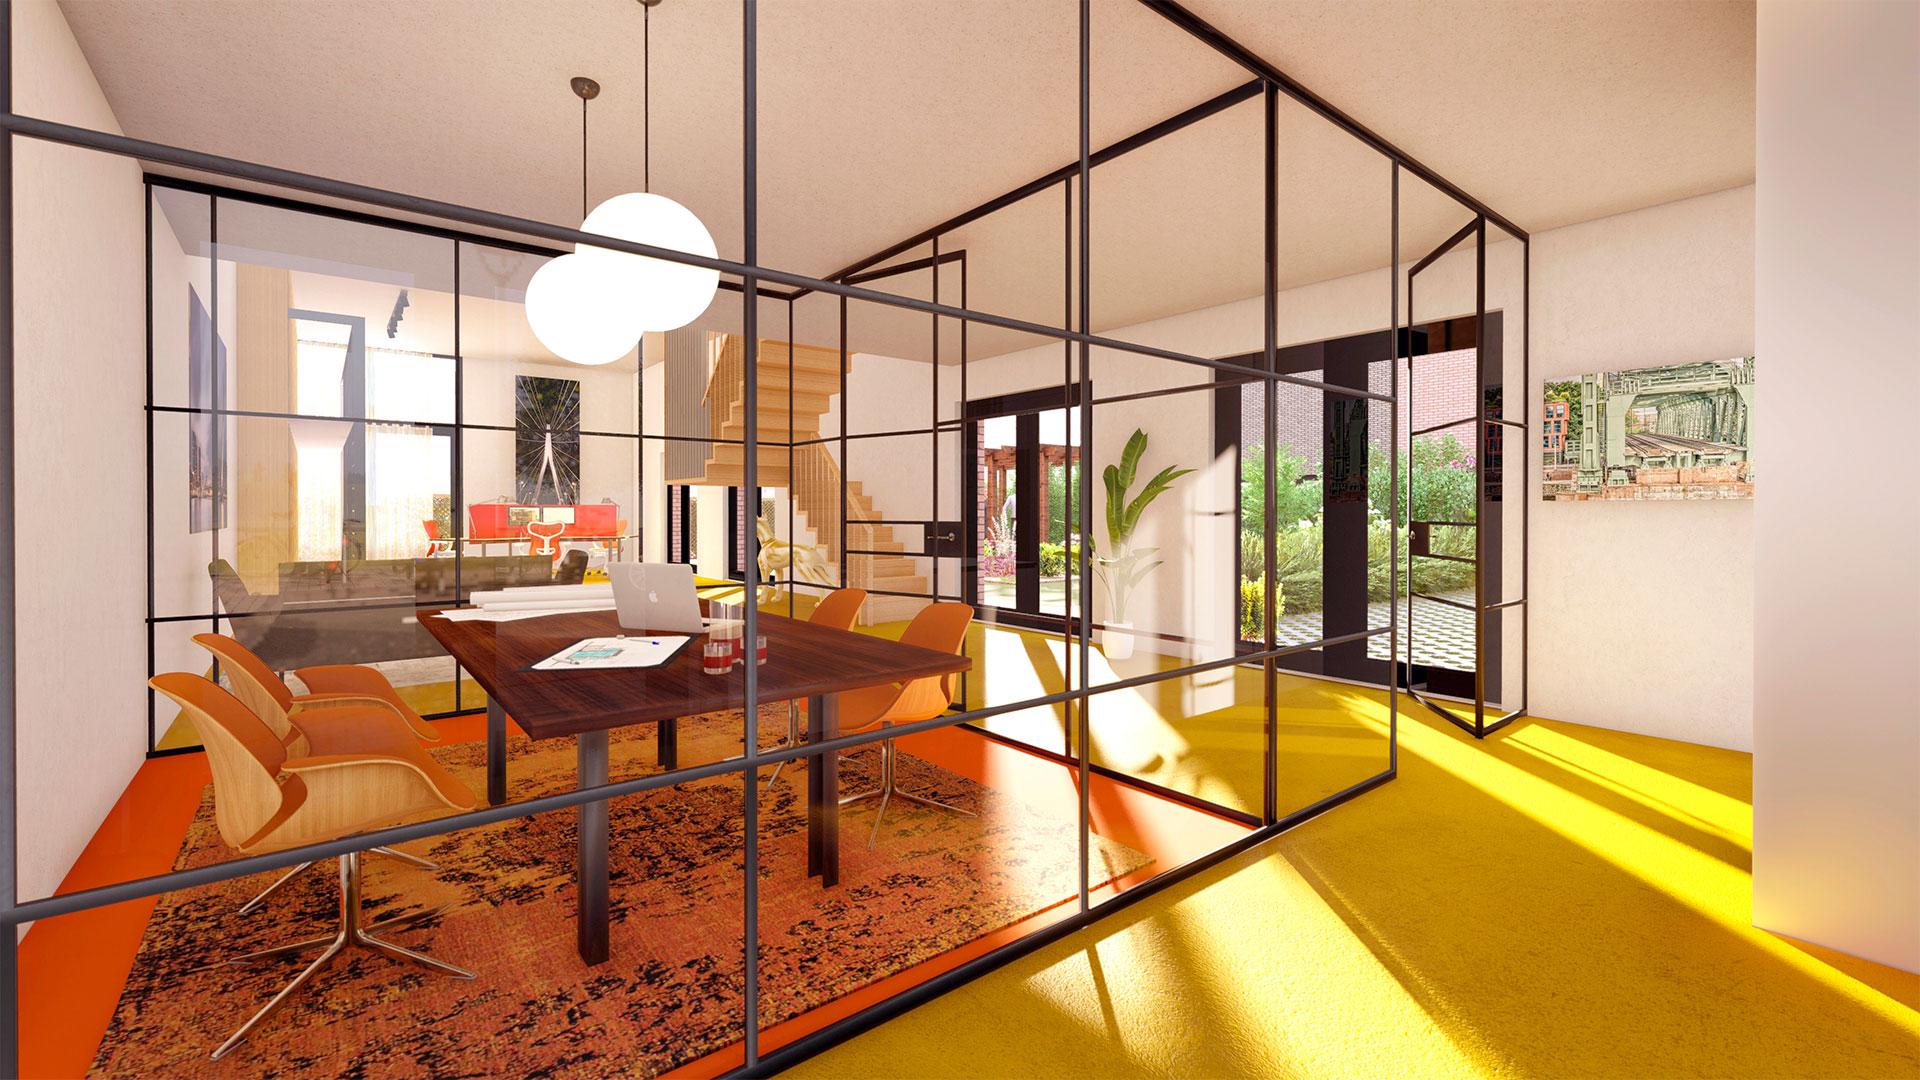 nexis-urban-villas-interieur-vergader-kamer.jpg